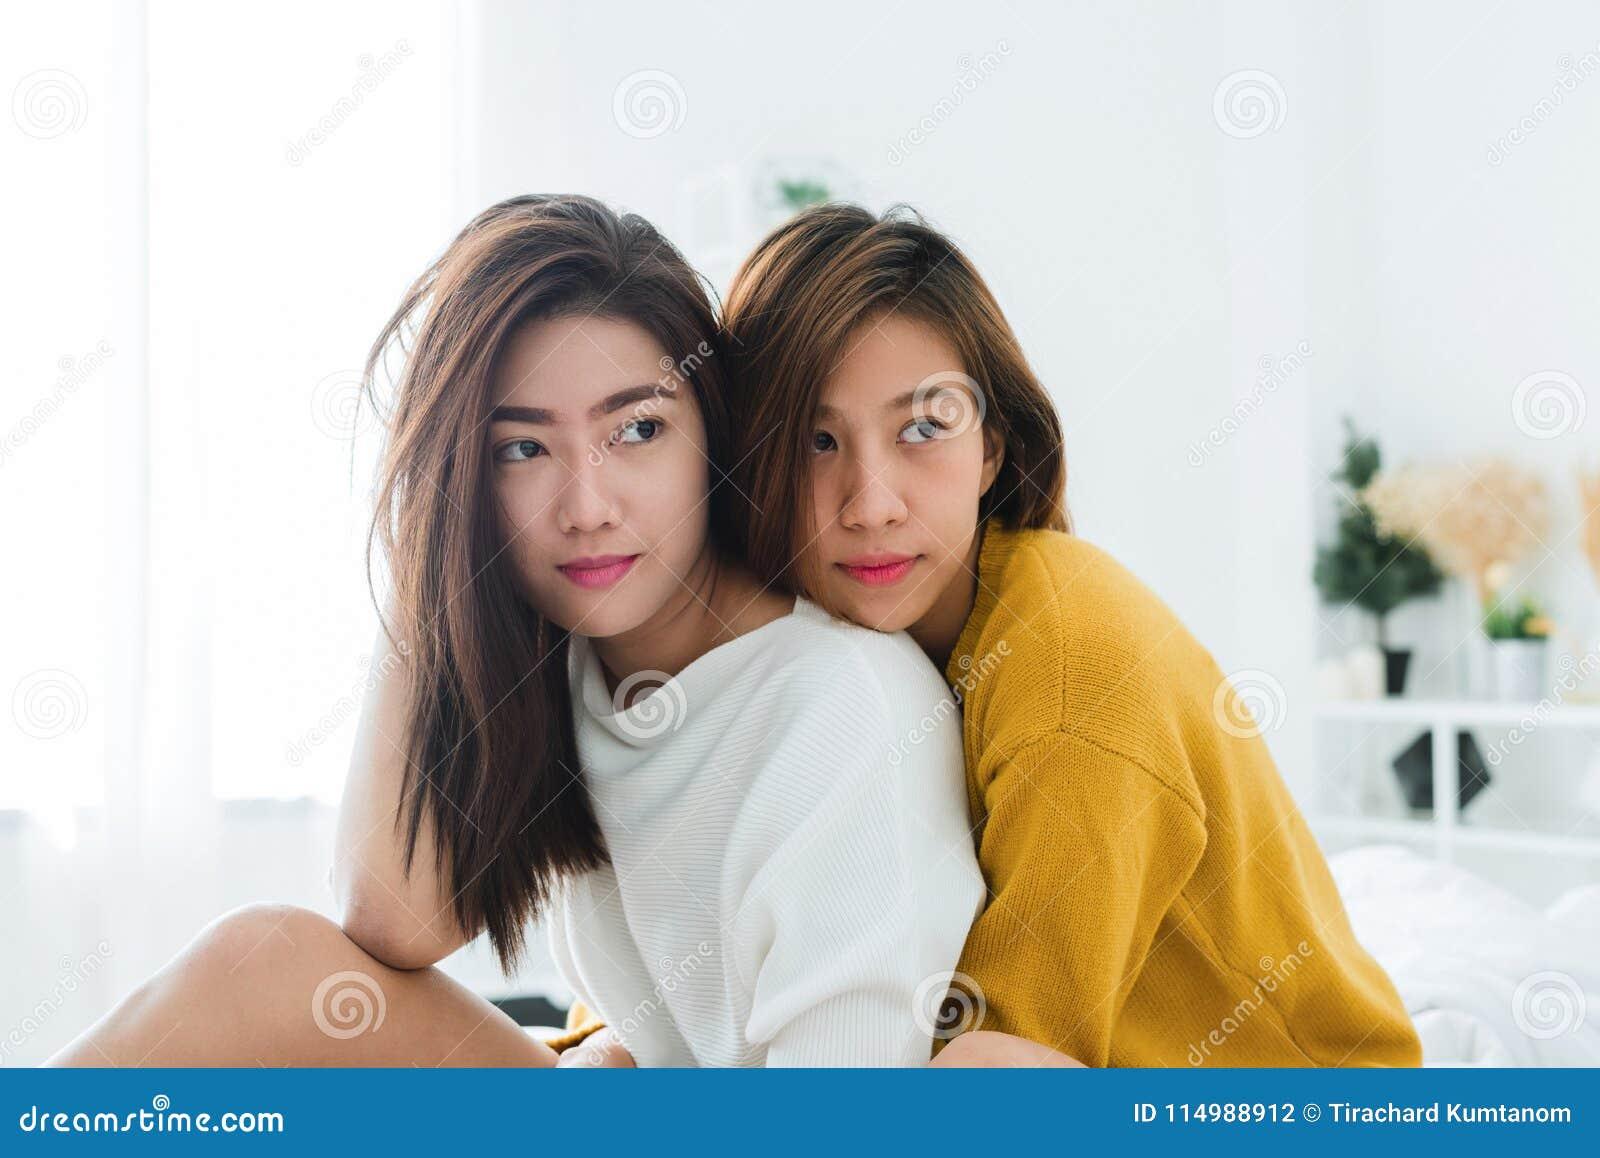 Young Libertines Threesome Hd